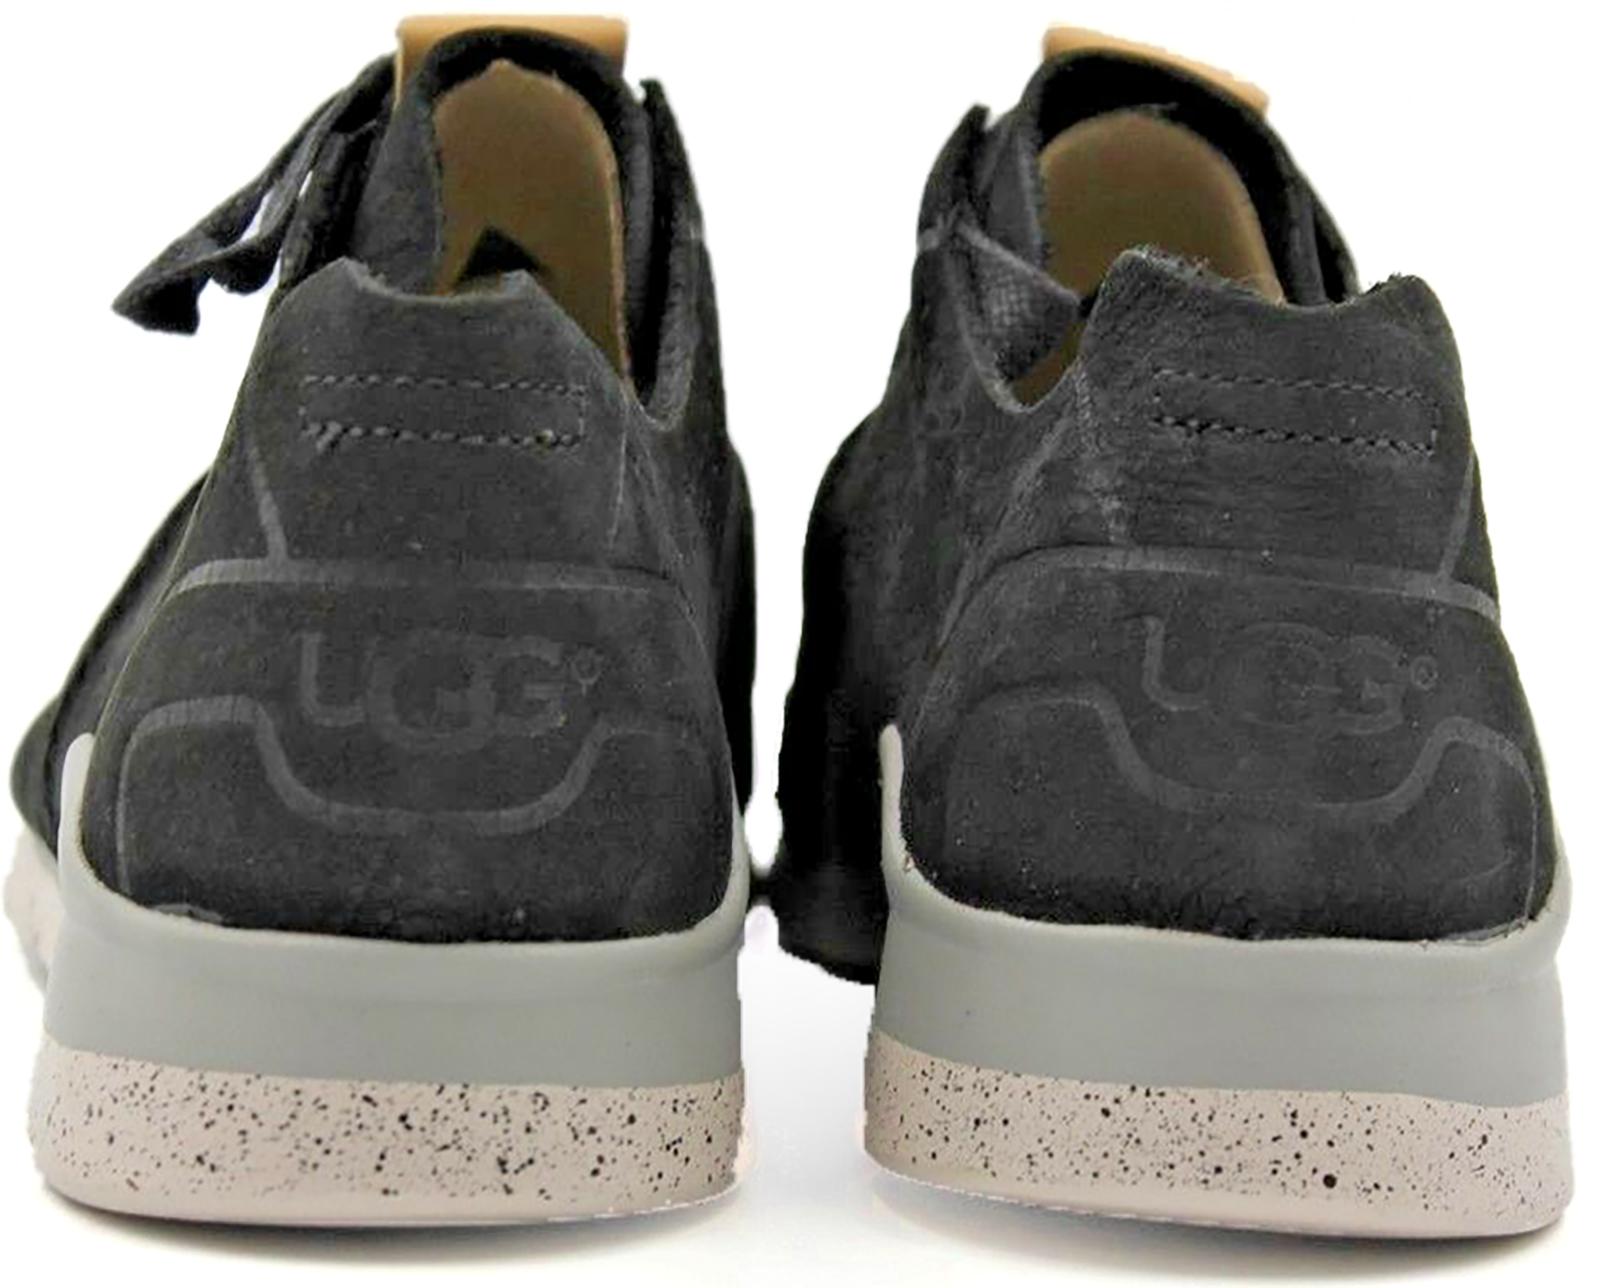 Ugg  Australia Tye Sneakers Tennis Black Women's Casual Shoes Size 6  image 4